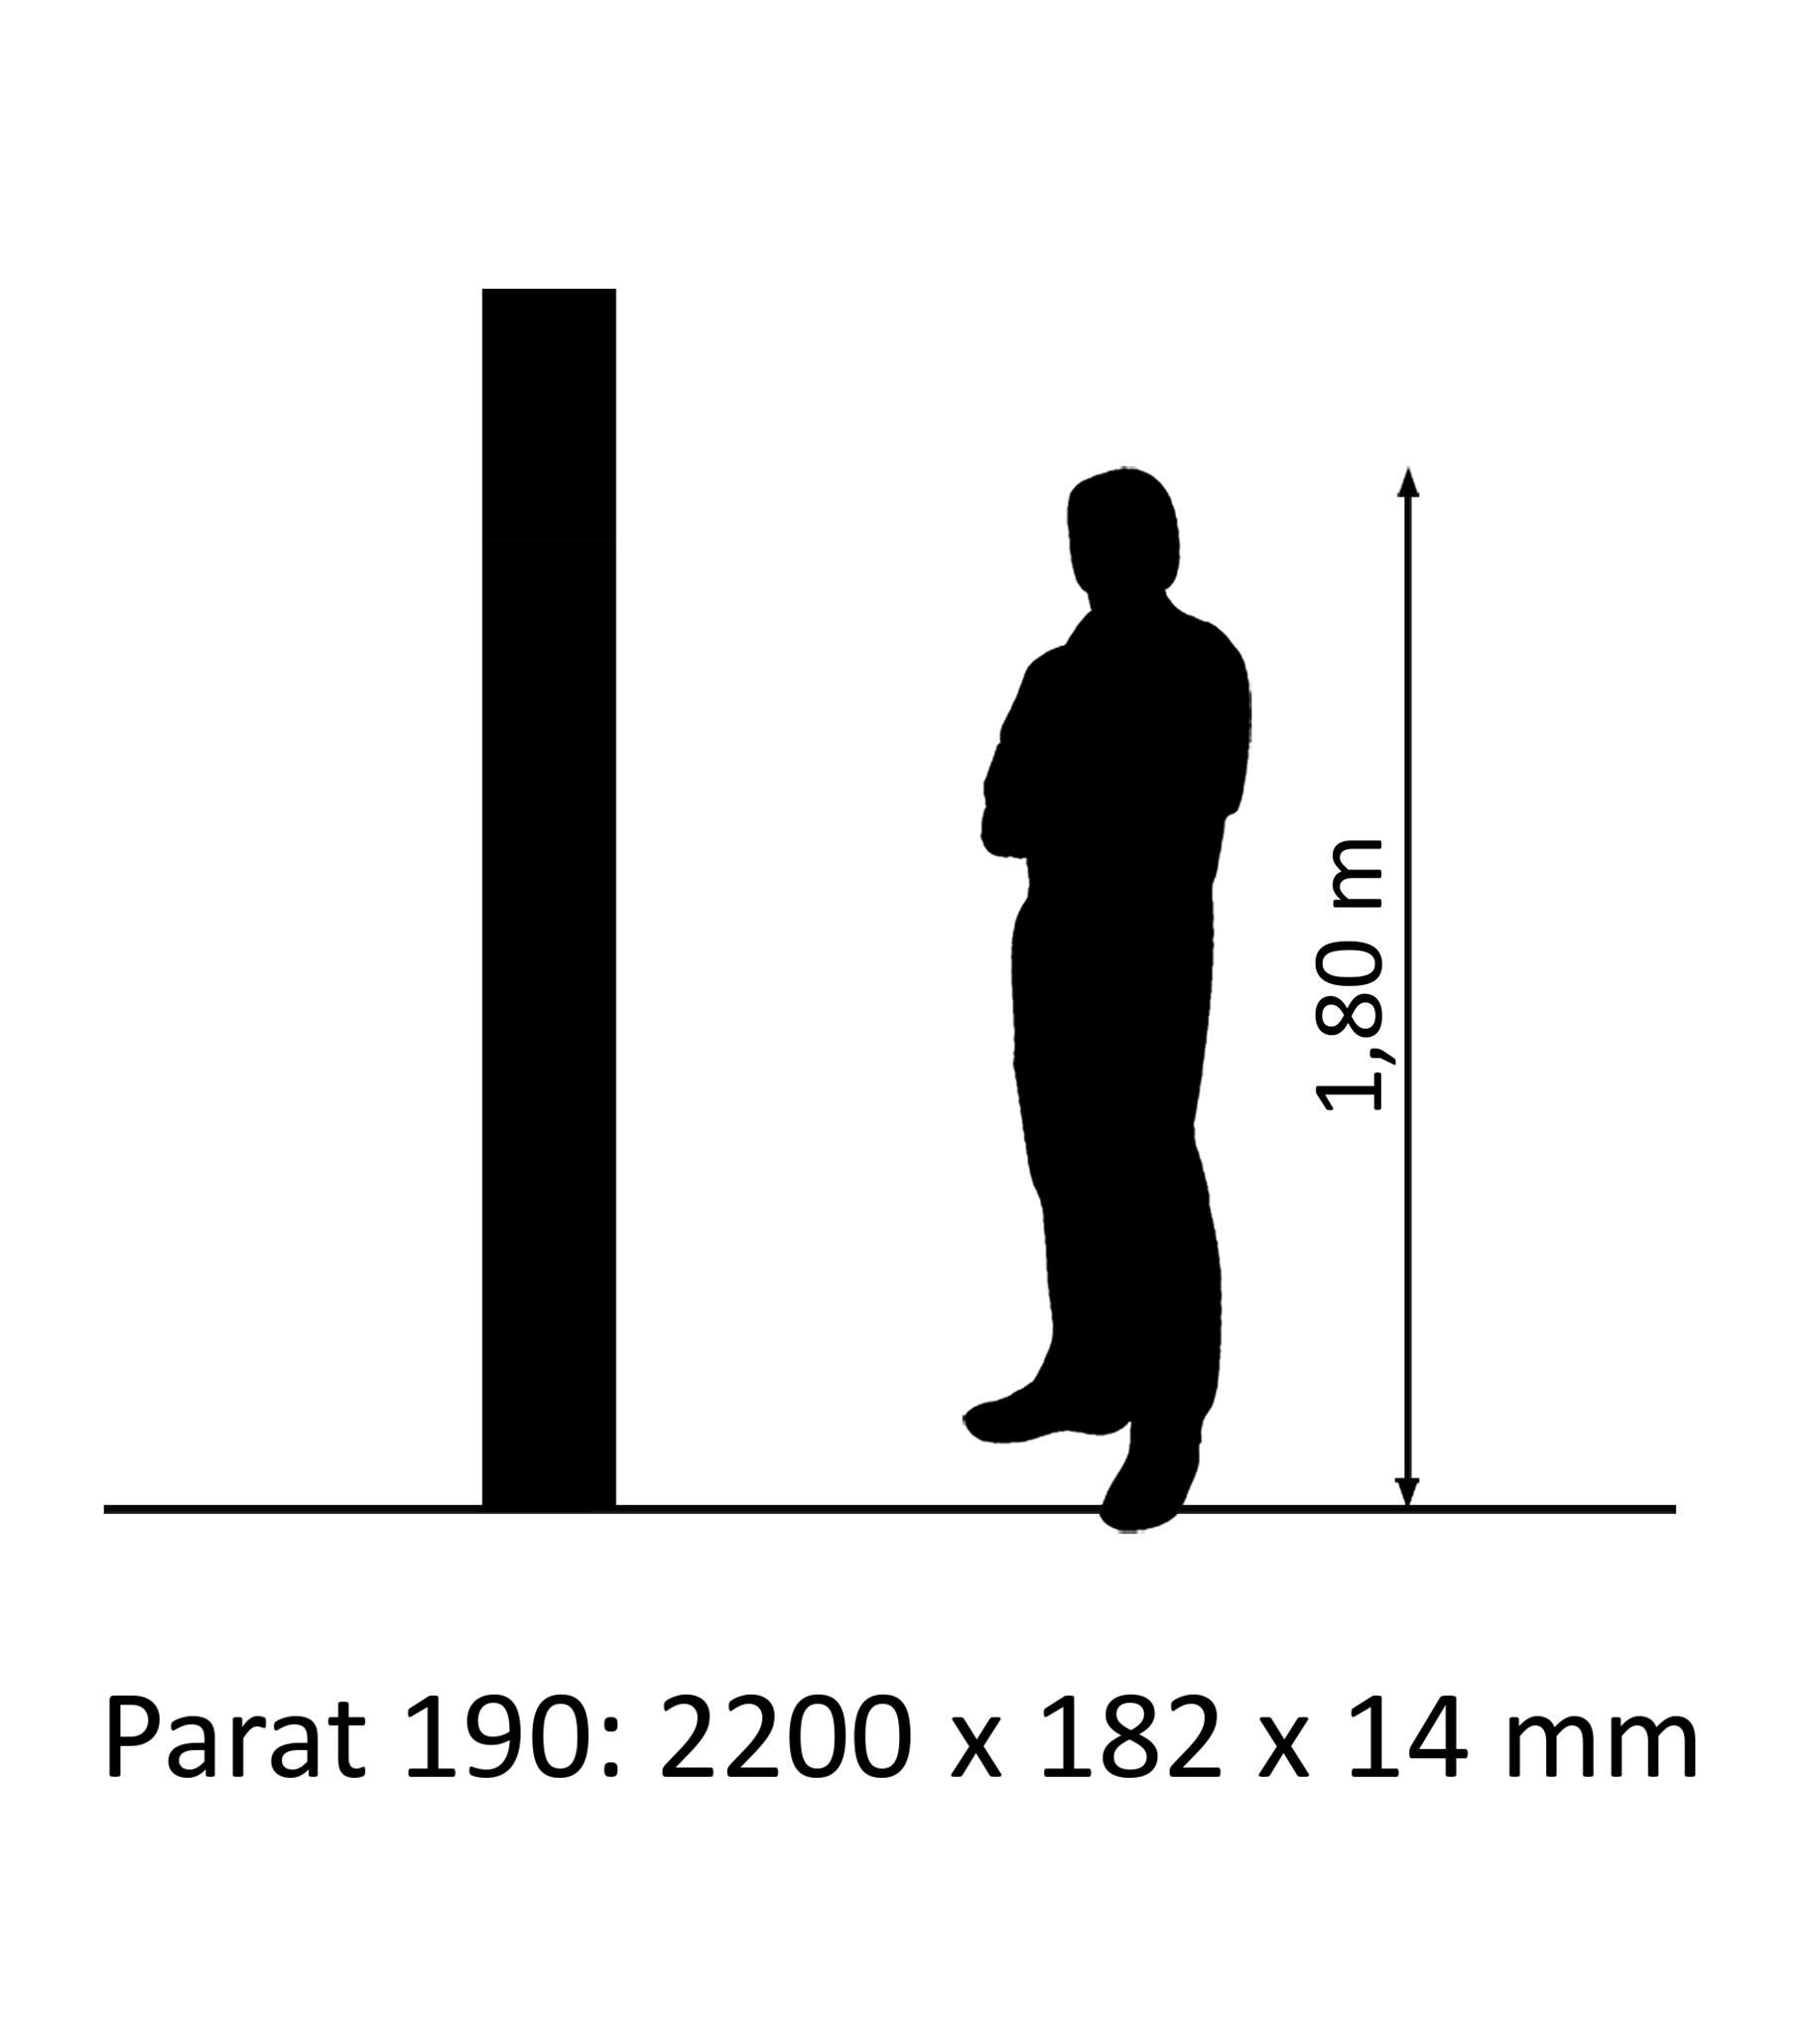 PARAT 190 Eiche Natur/Classic SB 14mm